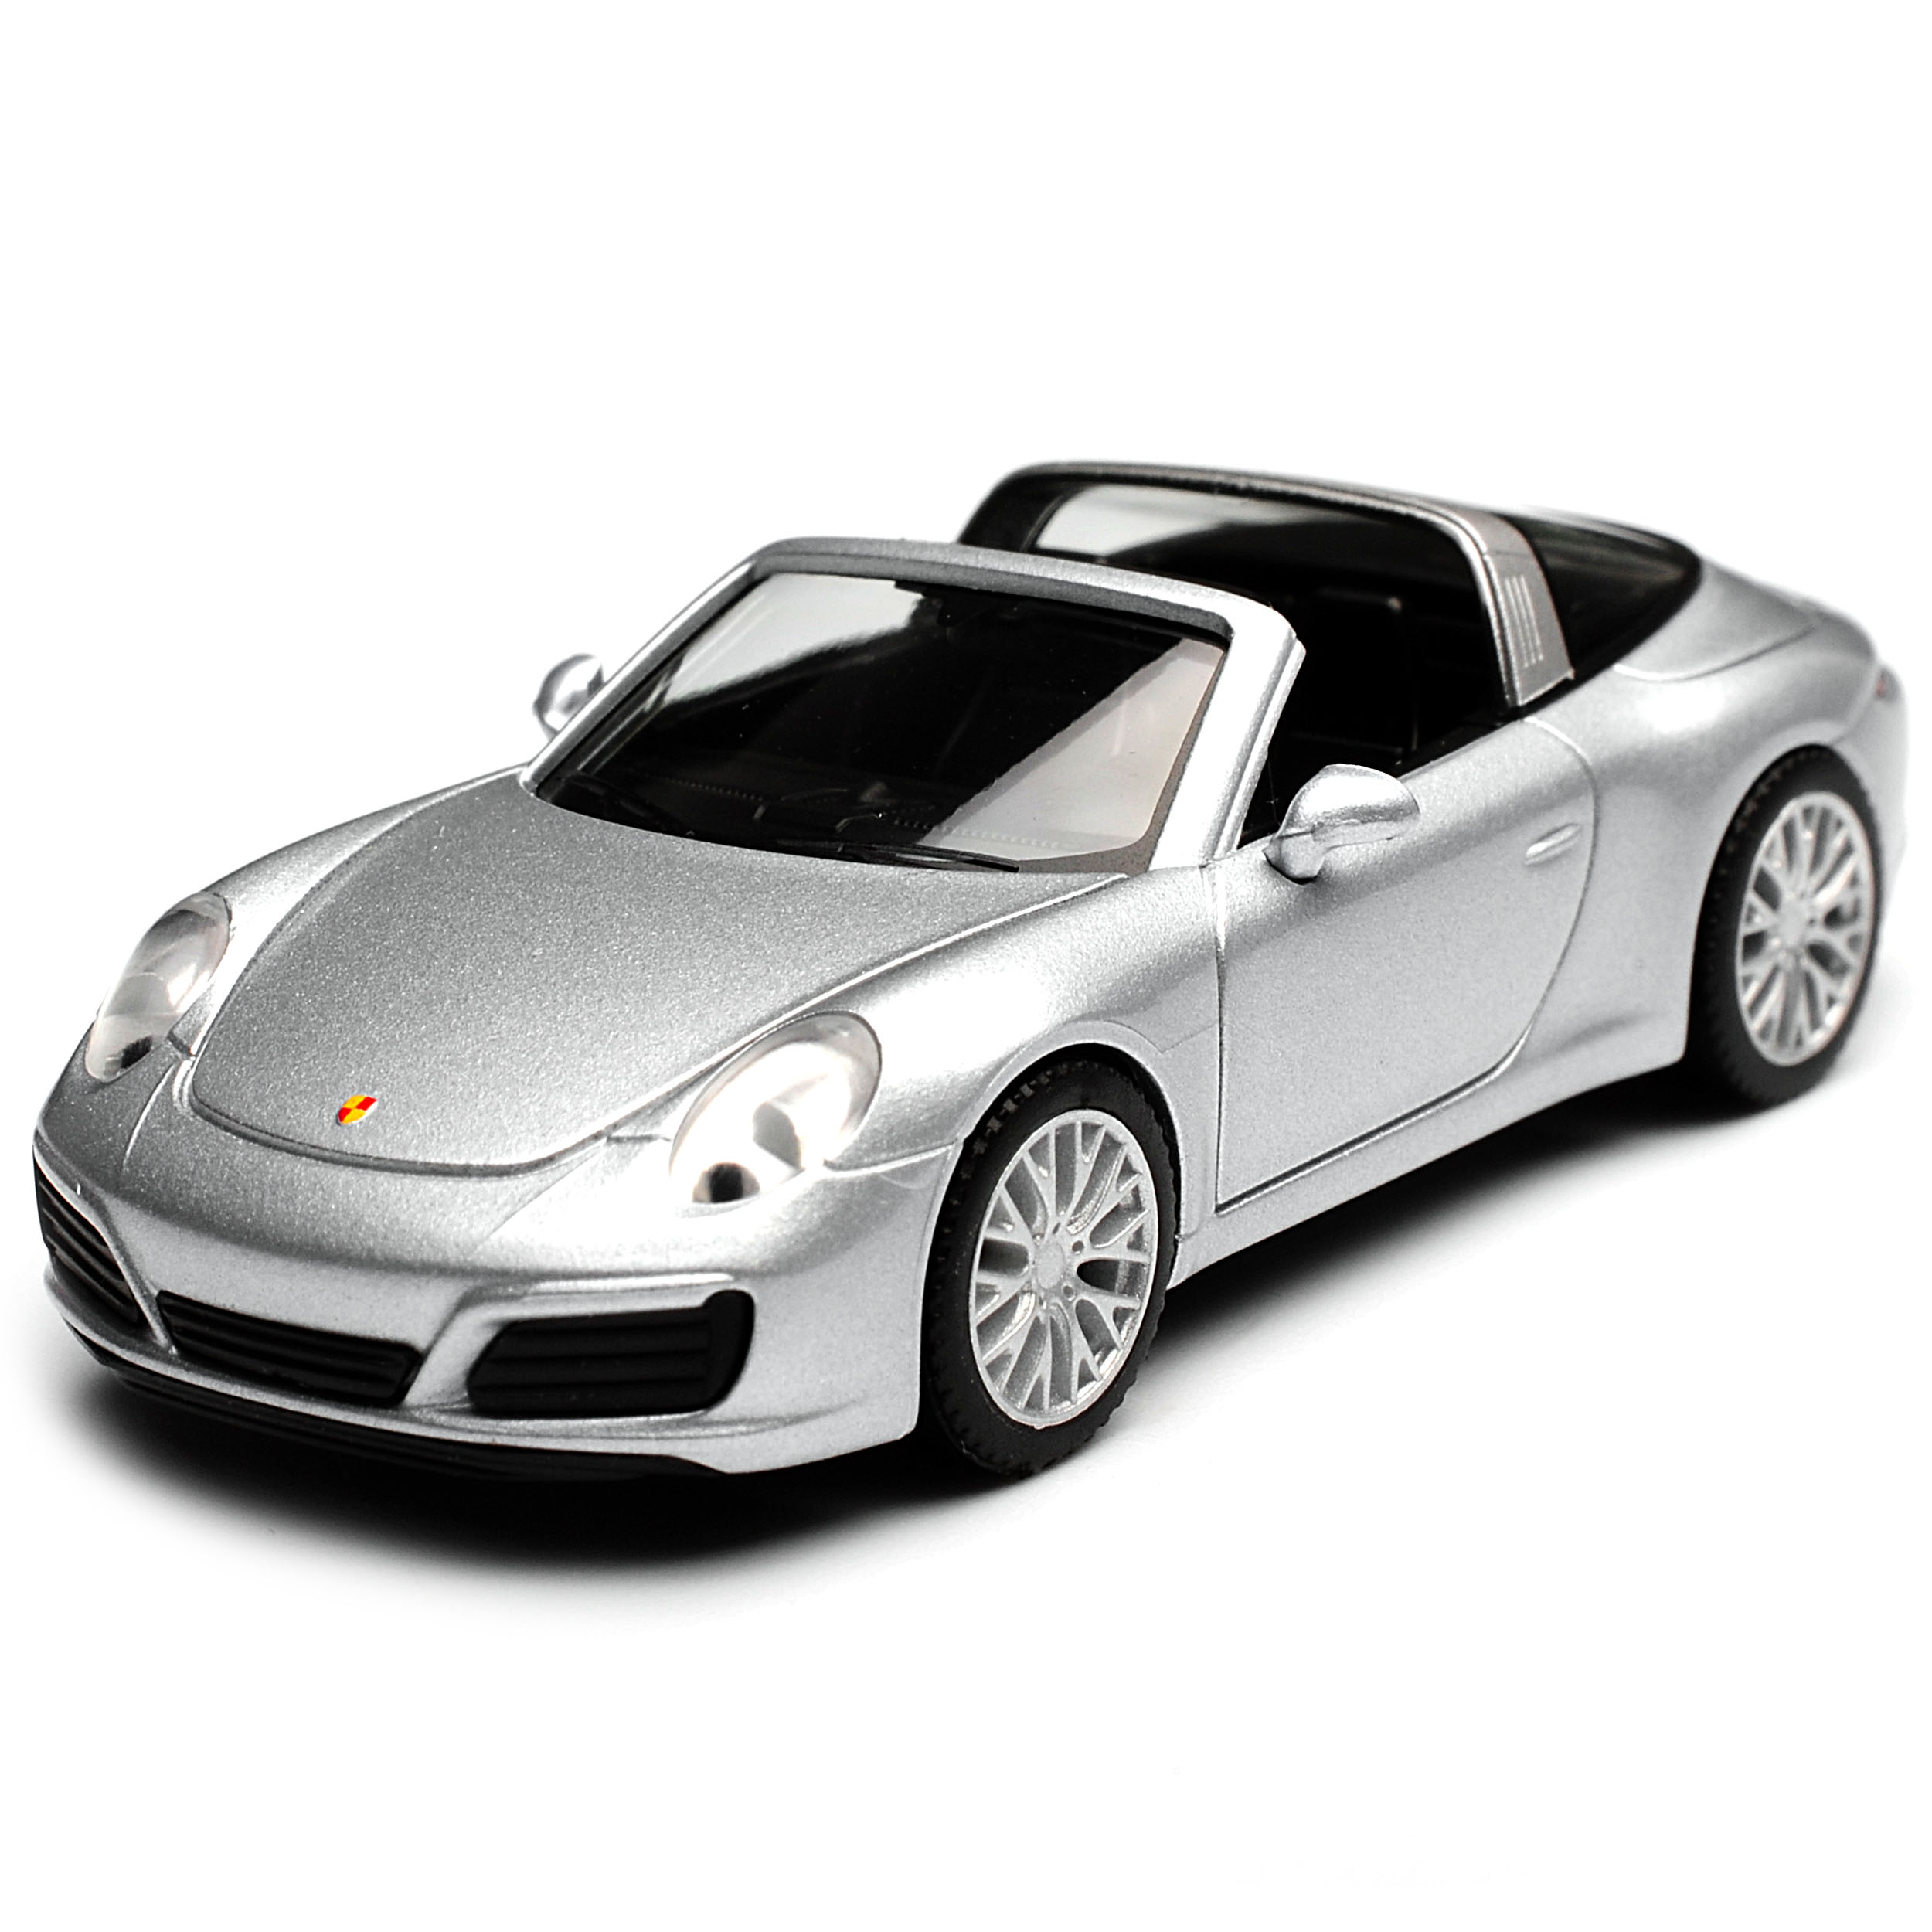 Porsche 911 991 Targa Cabrio Rhodium Silber Metallic Modell Ab 2012 Ab Facelif..